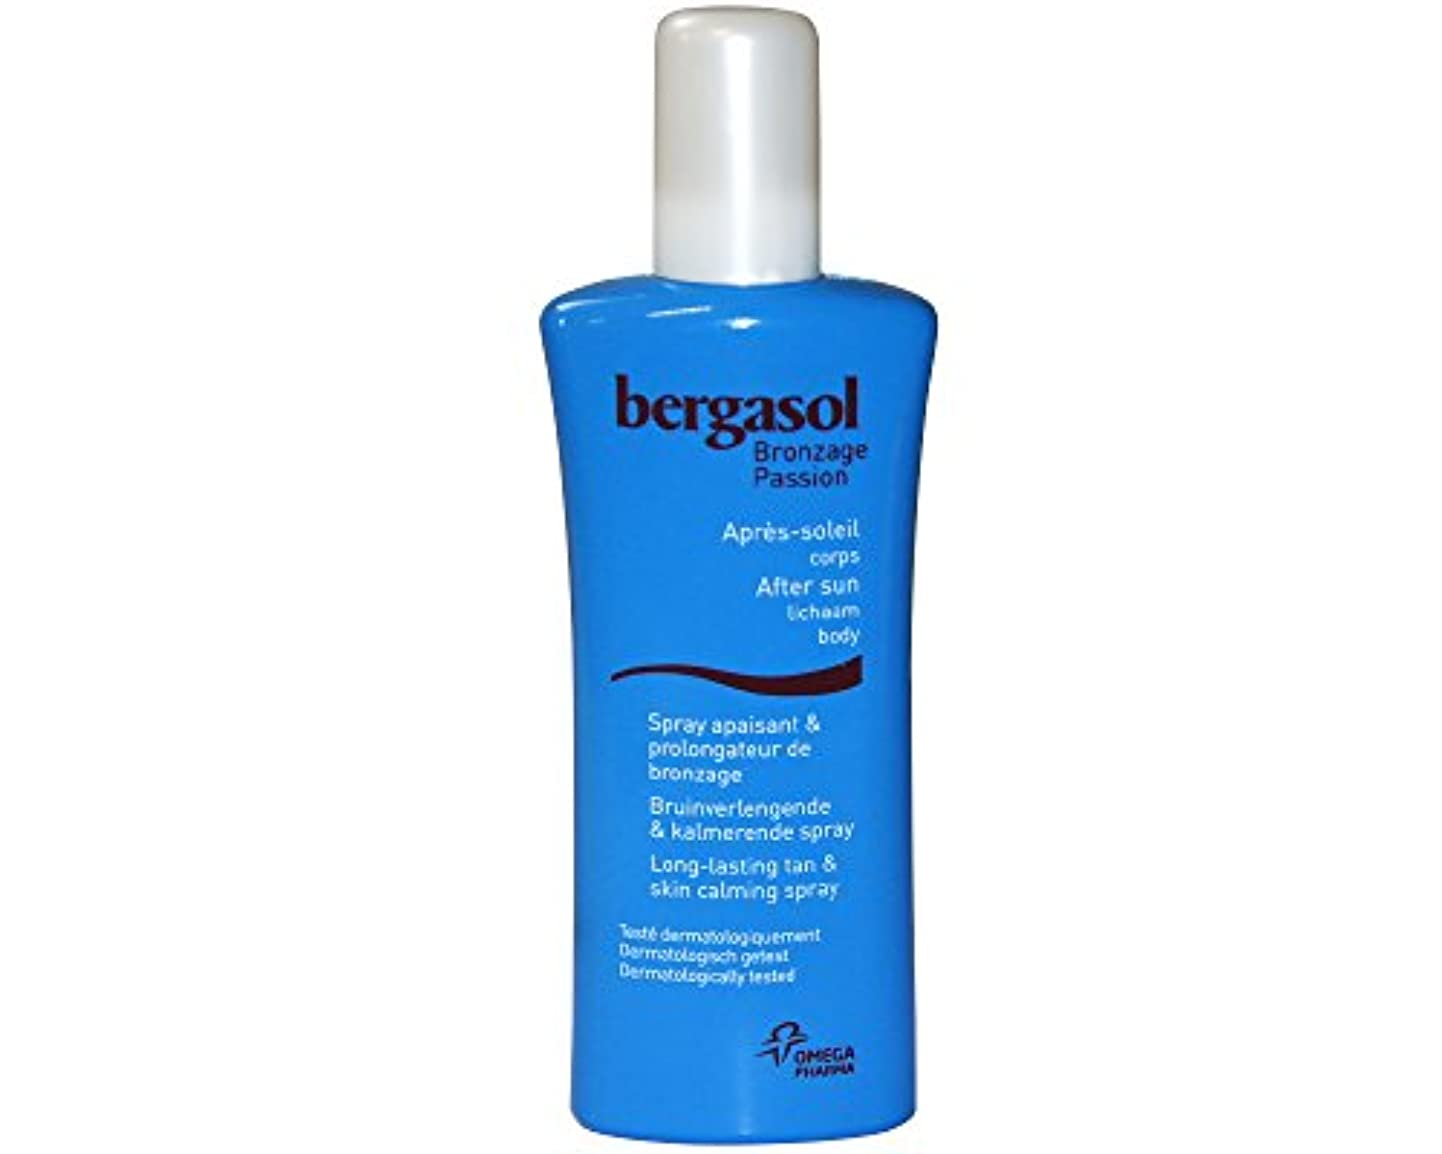 猛烈な欠陥クリークBergasol After Sun Bräunungsverlängernde Pflegelotion Spray, Bräunung und Beruhigung Spray, 125ml